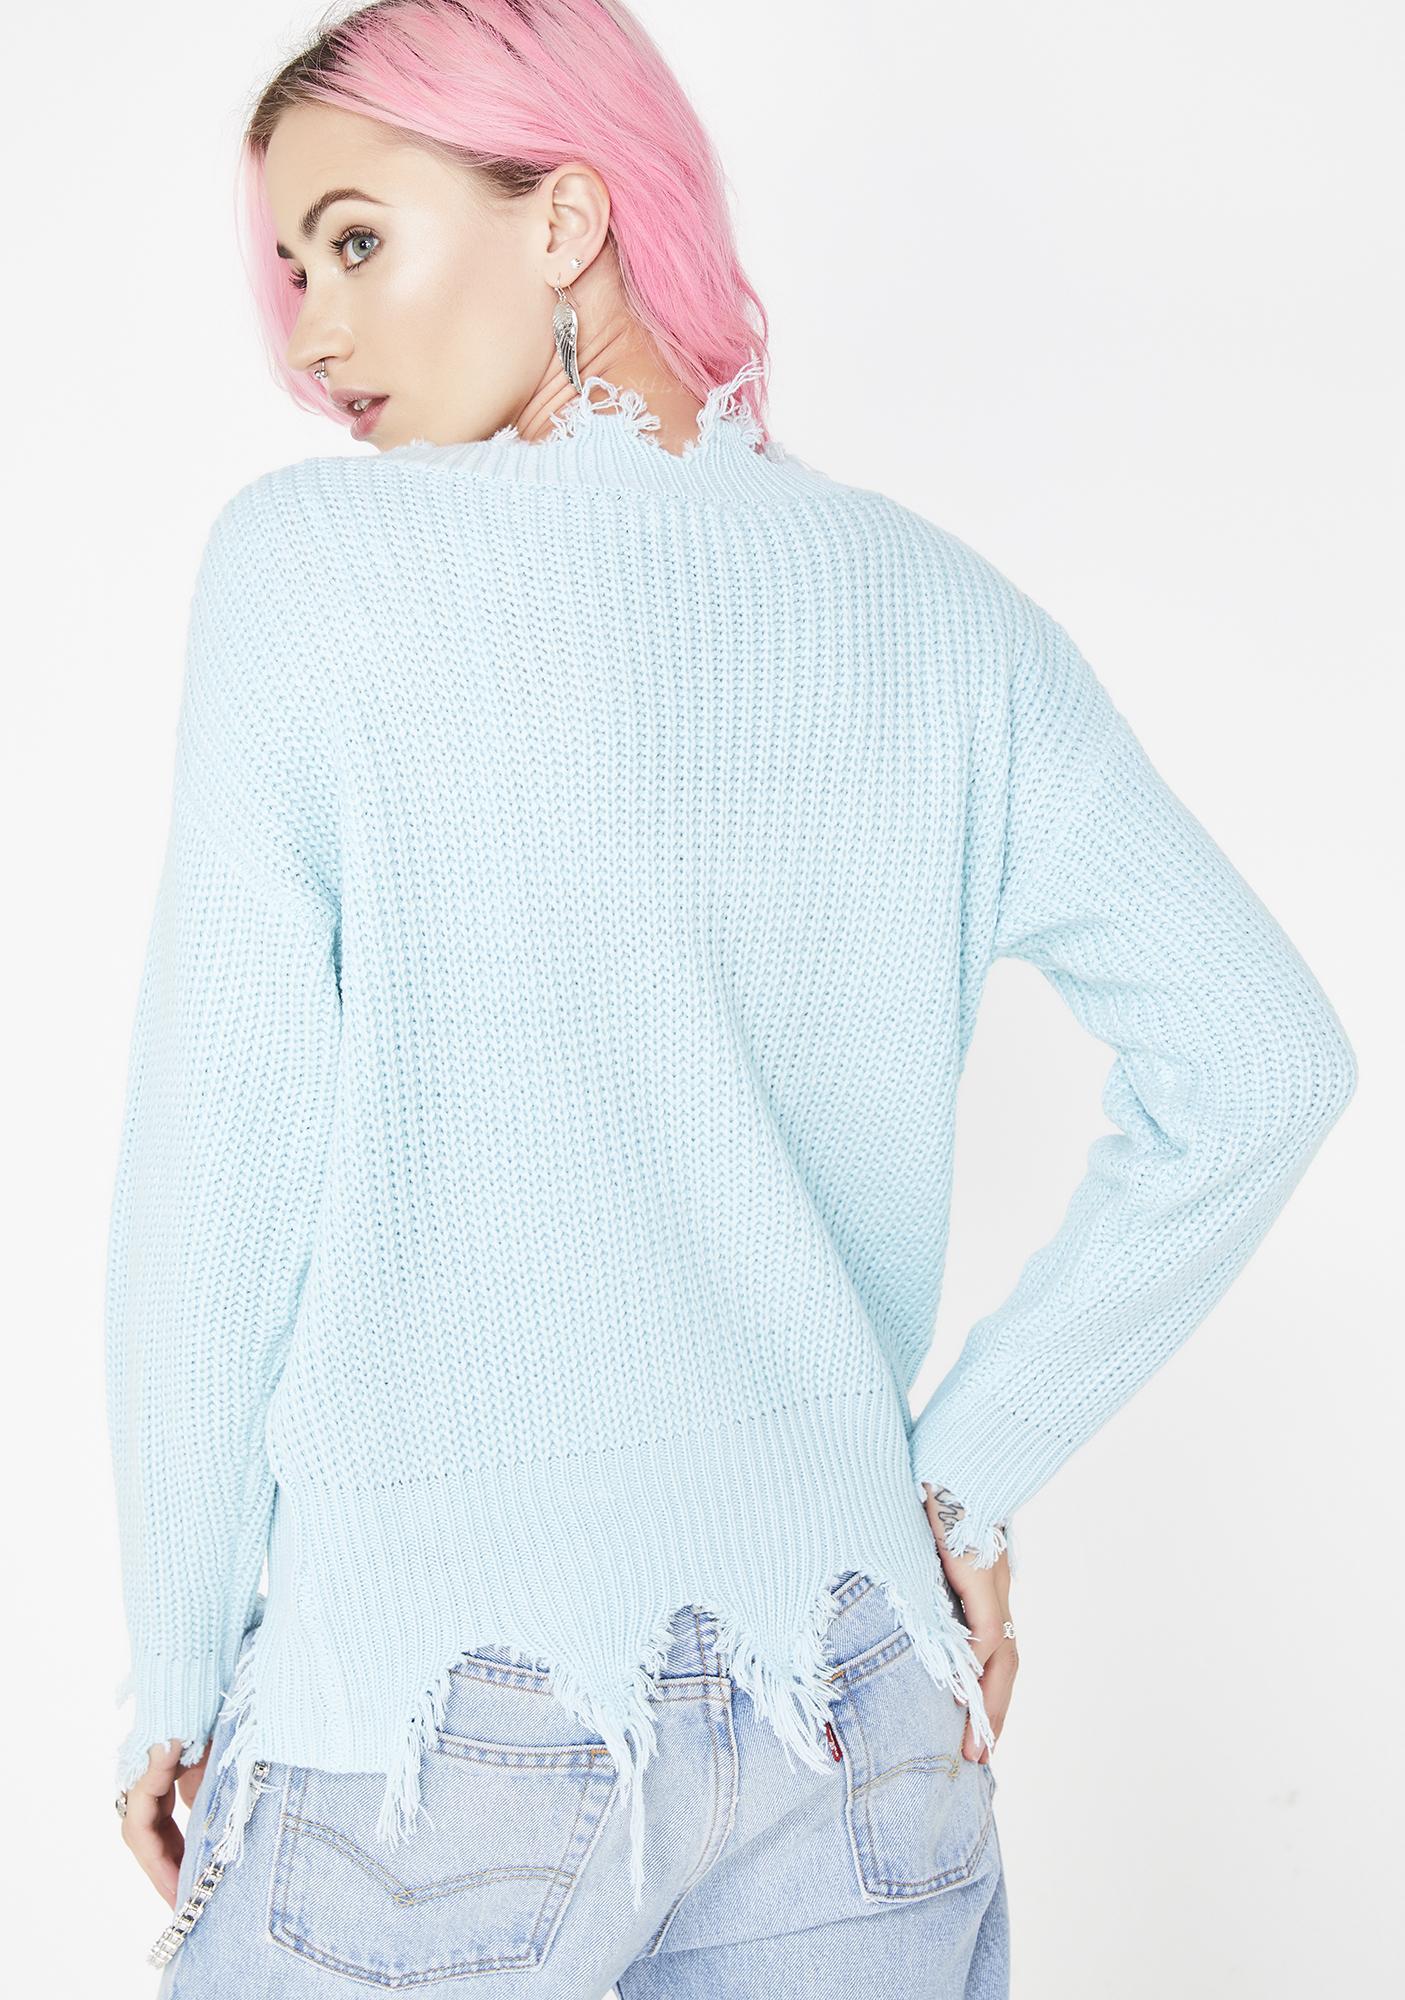 Sky Pickin' Posies Distressed Sweater